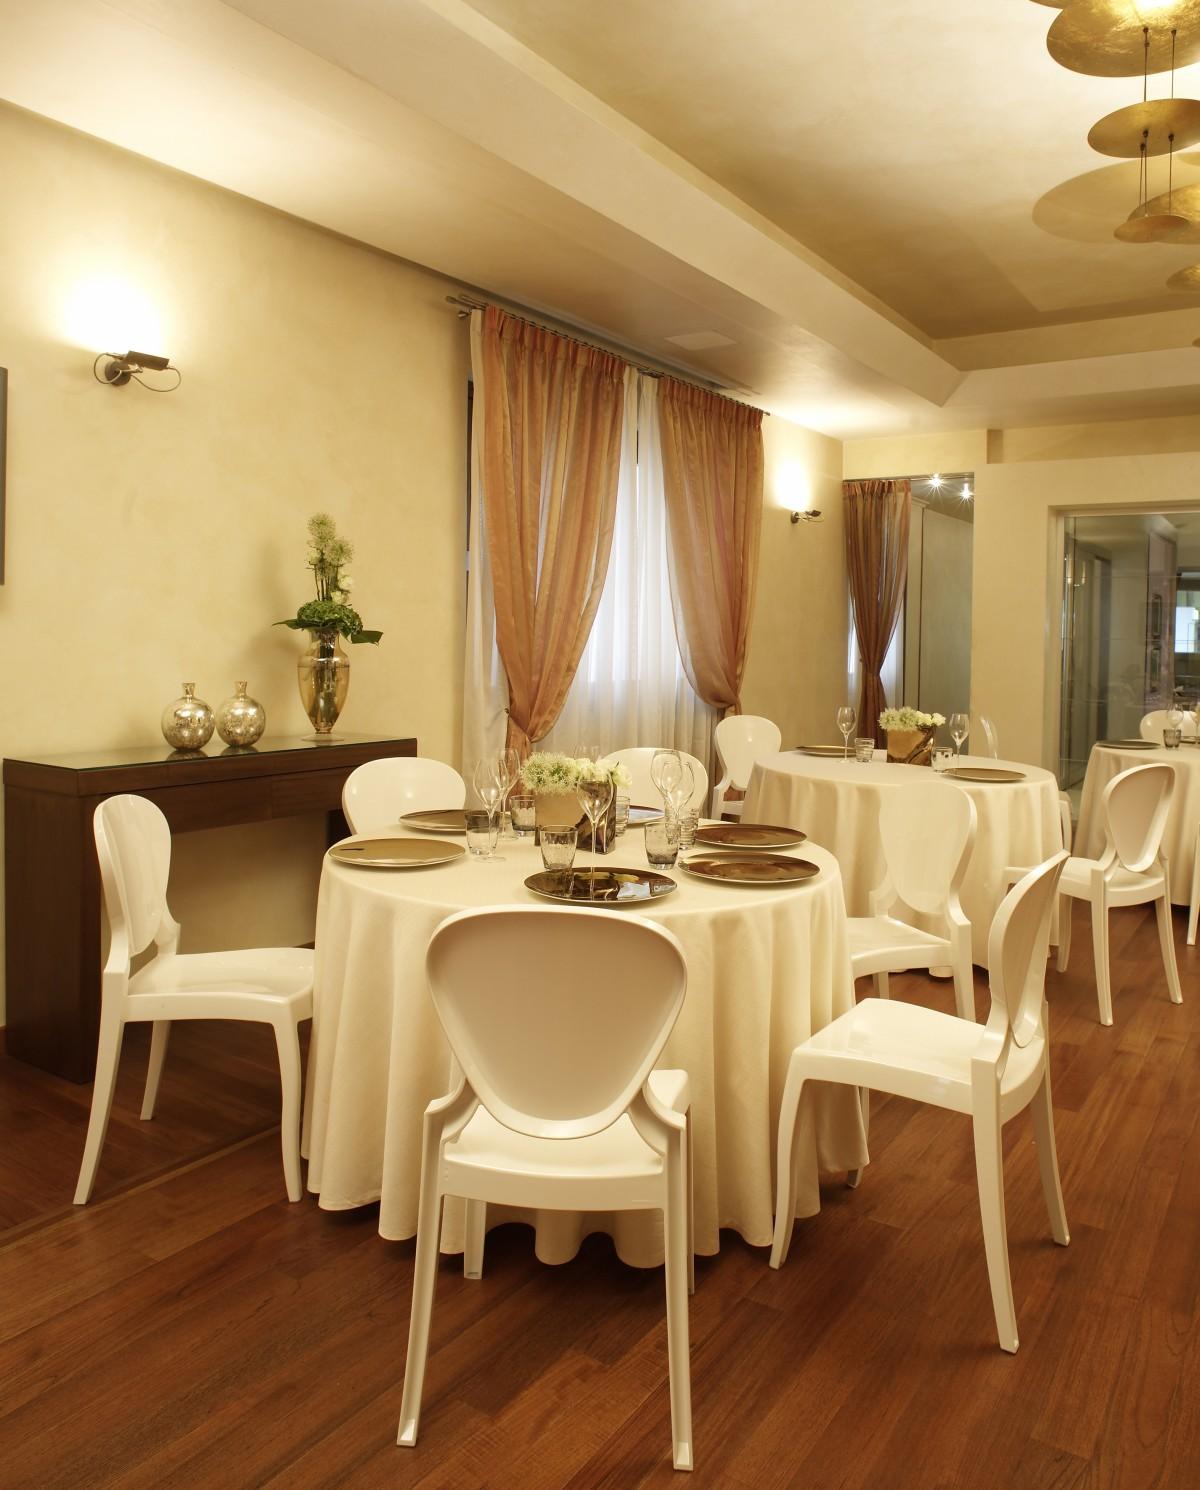 Queen 650 restaurant meubilair p m furniture horeca for Meubilair horeca